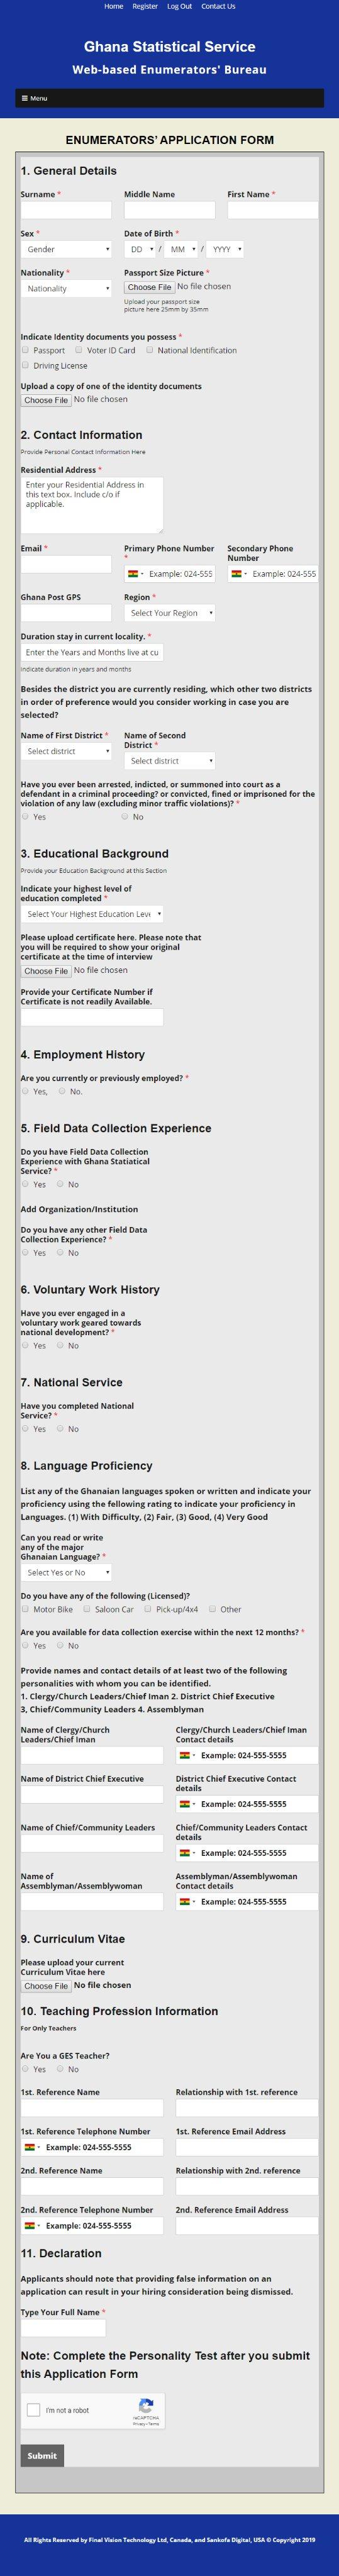 Ghana Statistical Service Recruitment 2020